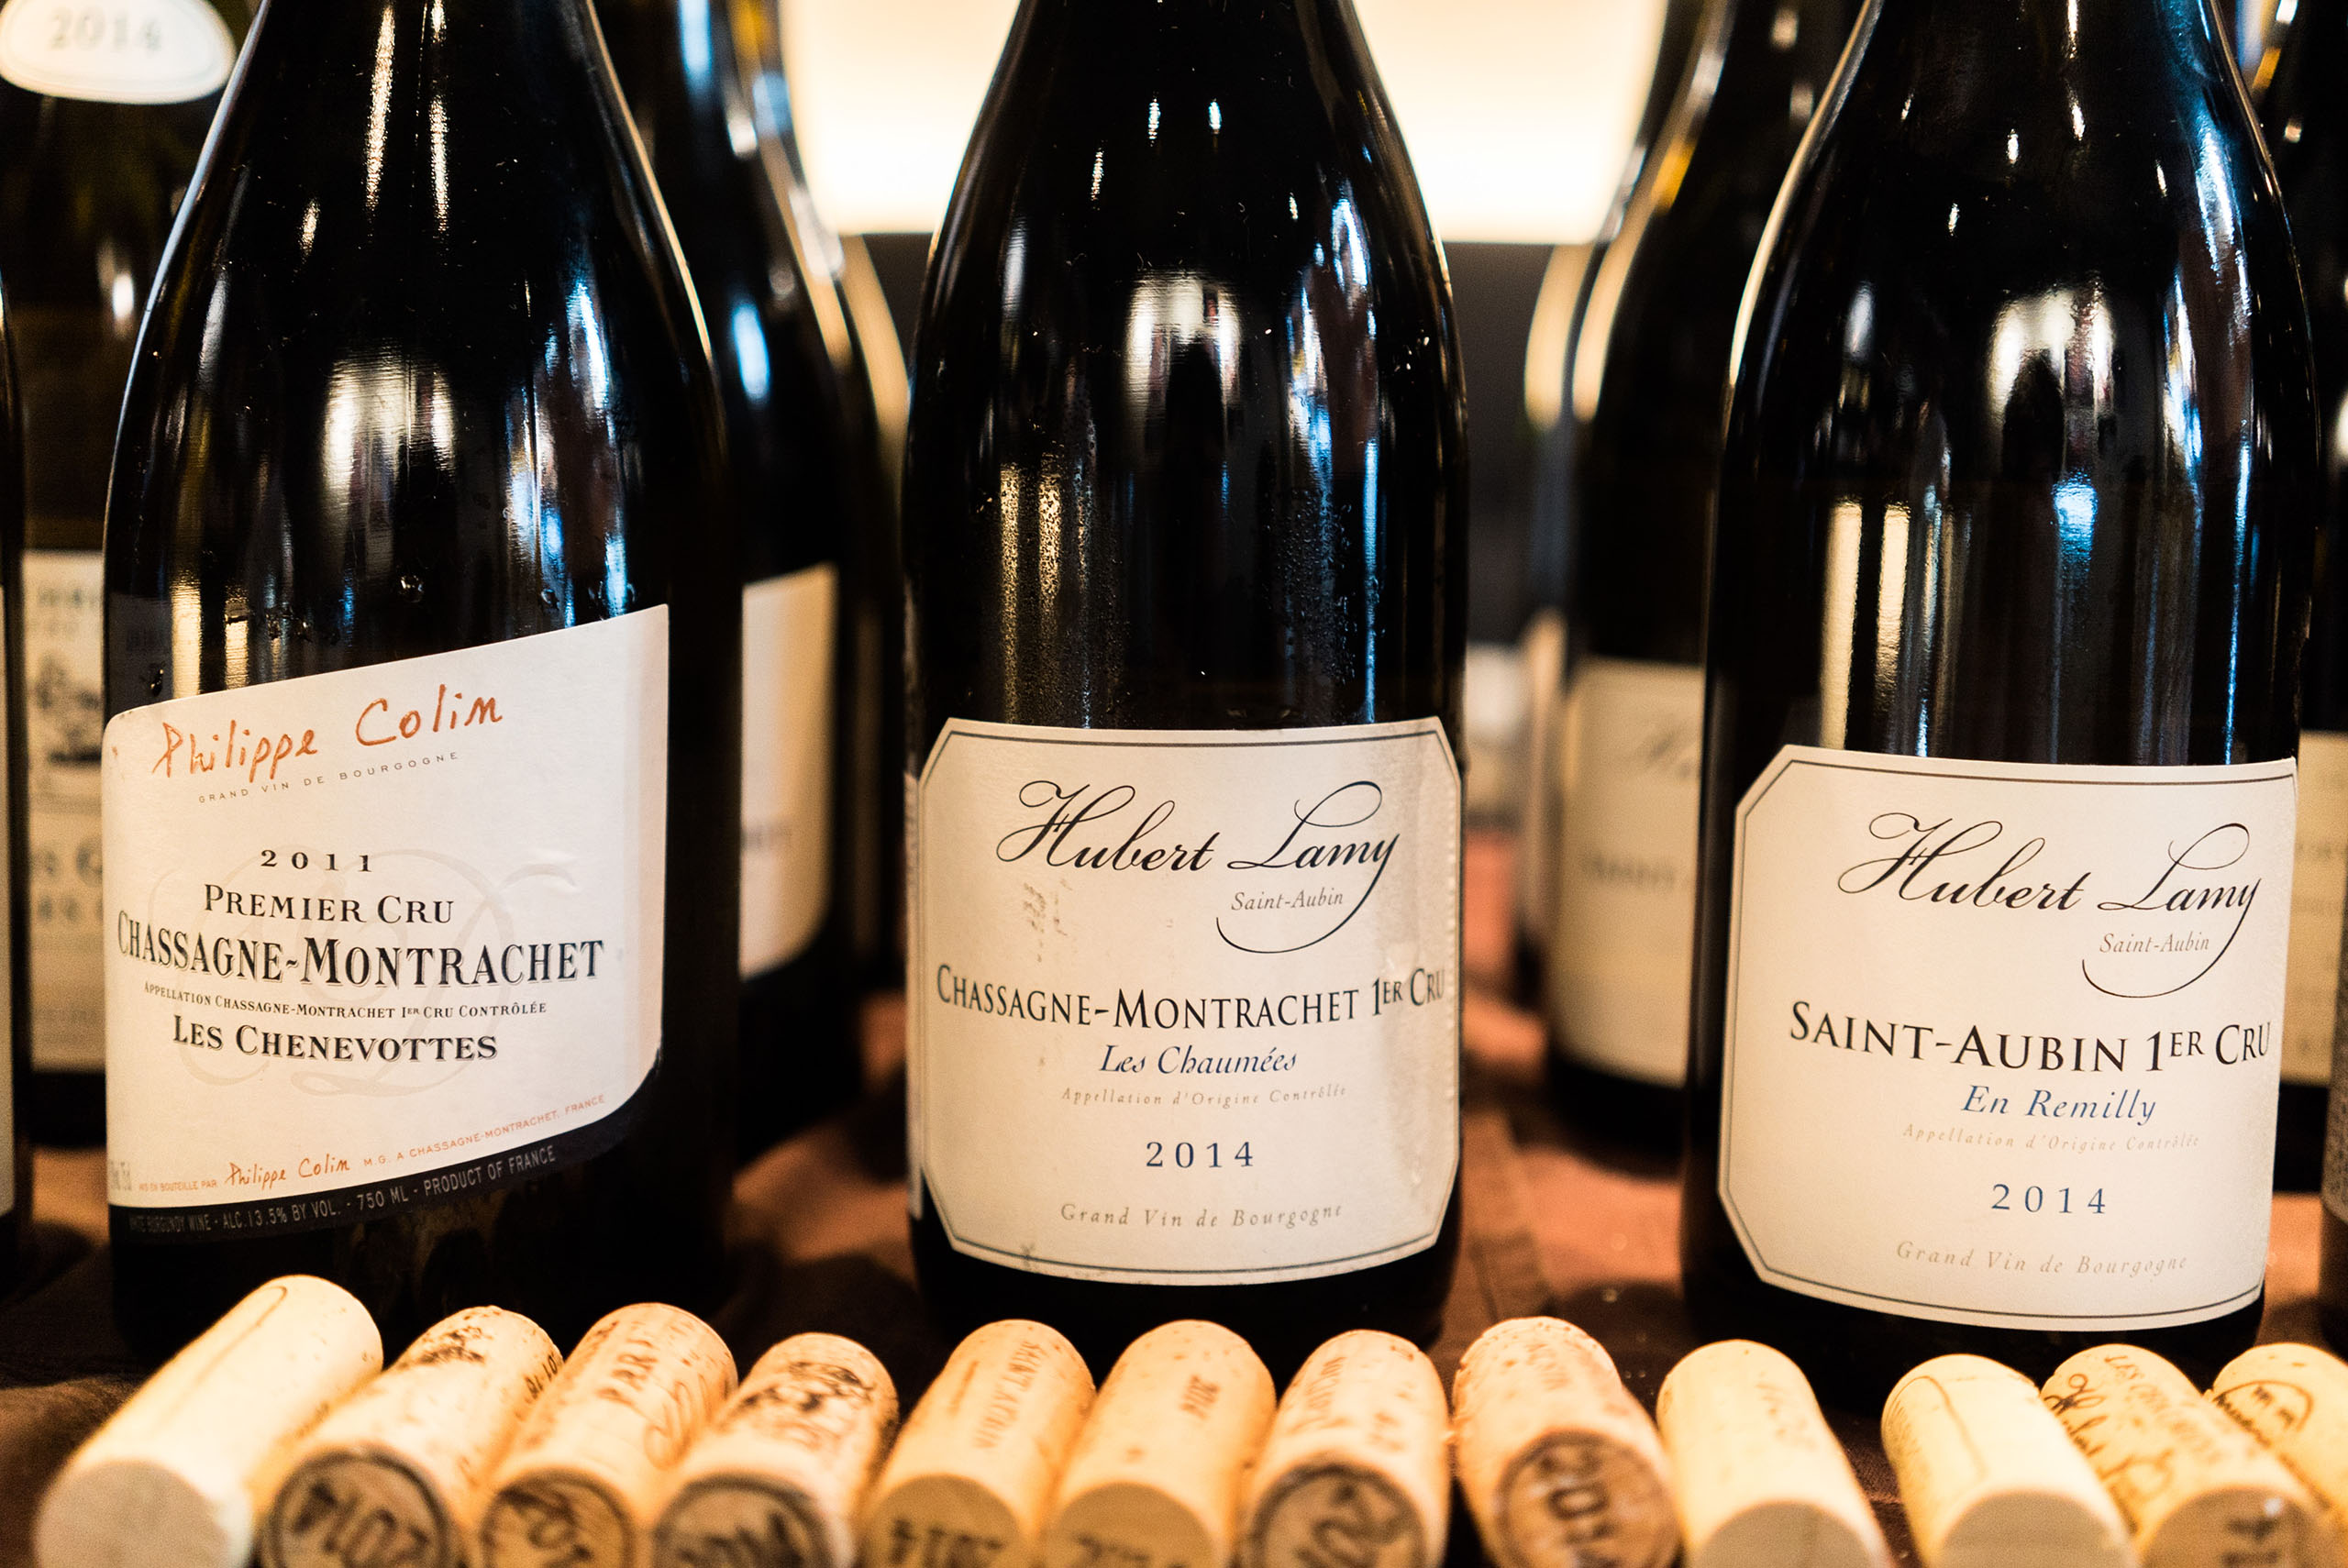 Hubert Lamy Chassagne-Montrachet 1er Les Chaumees 2014